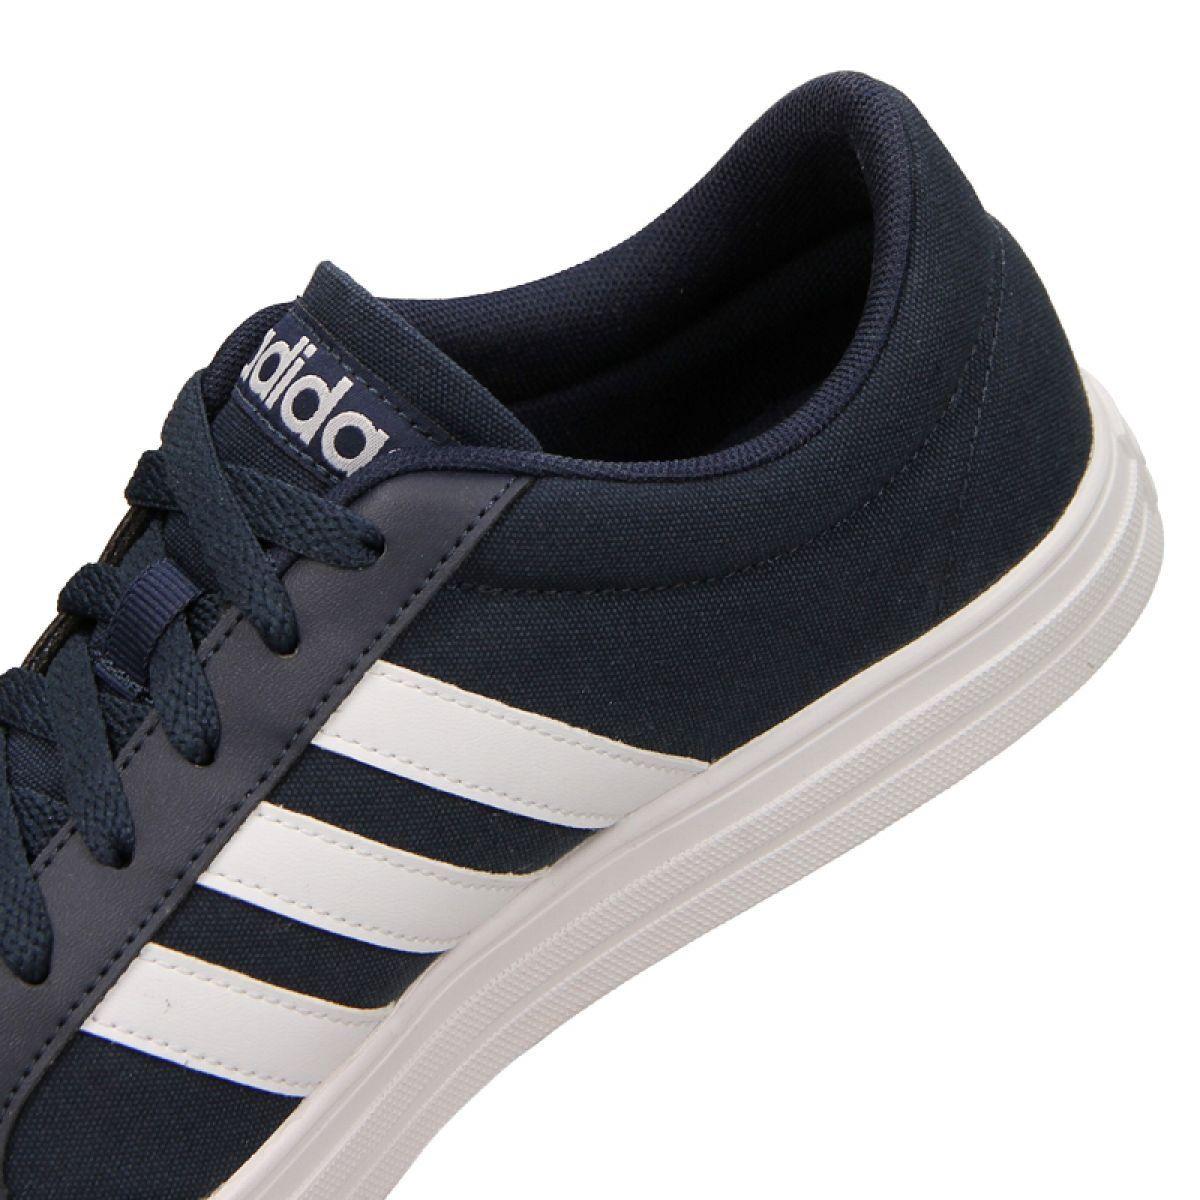 Sportowe Meskie Adidas Granatowe Buty Adidas Vs Set M Aw3891 Adidas Set Shoes Adidas